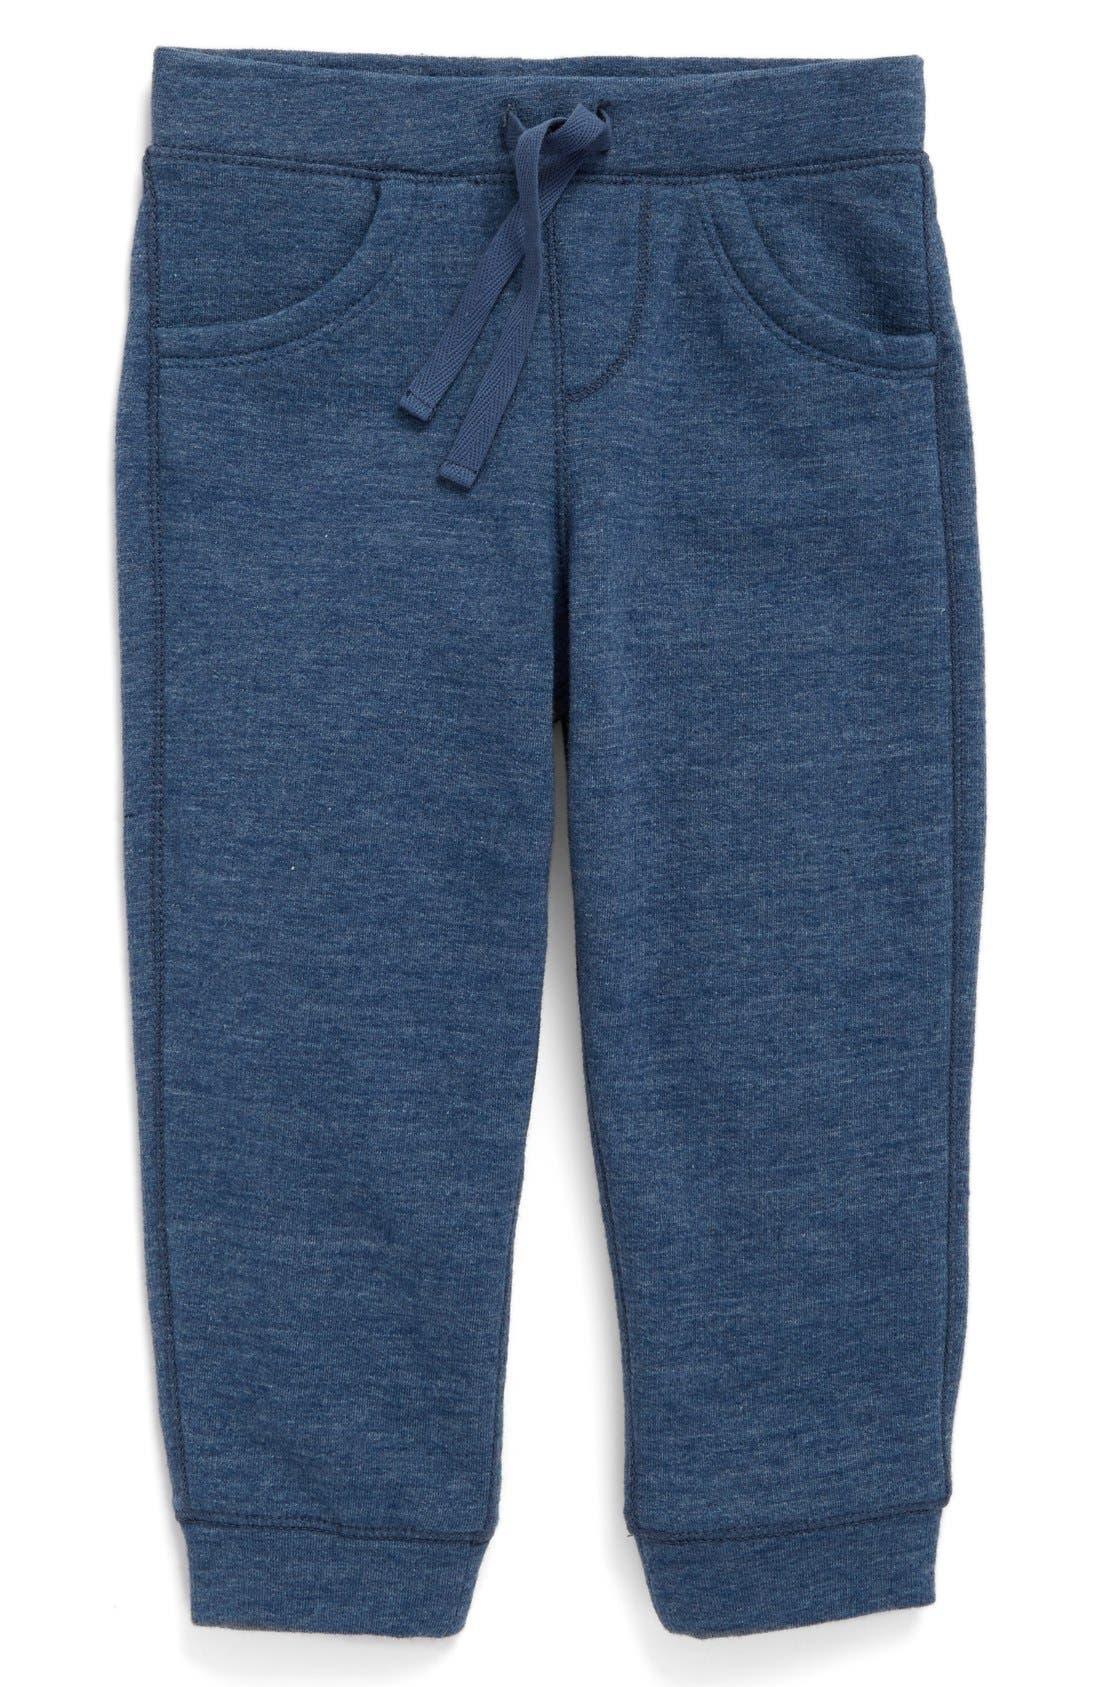 Alternate Image 1 Selected - Tucker + Tate Fleece Sweatpants (Baby)